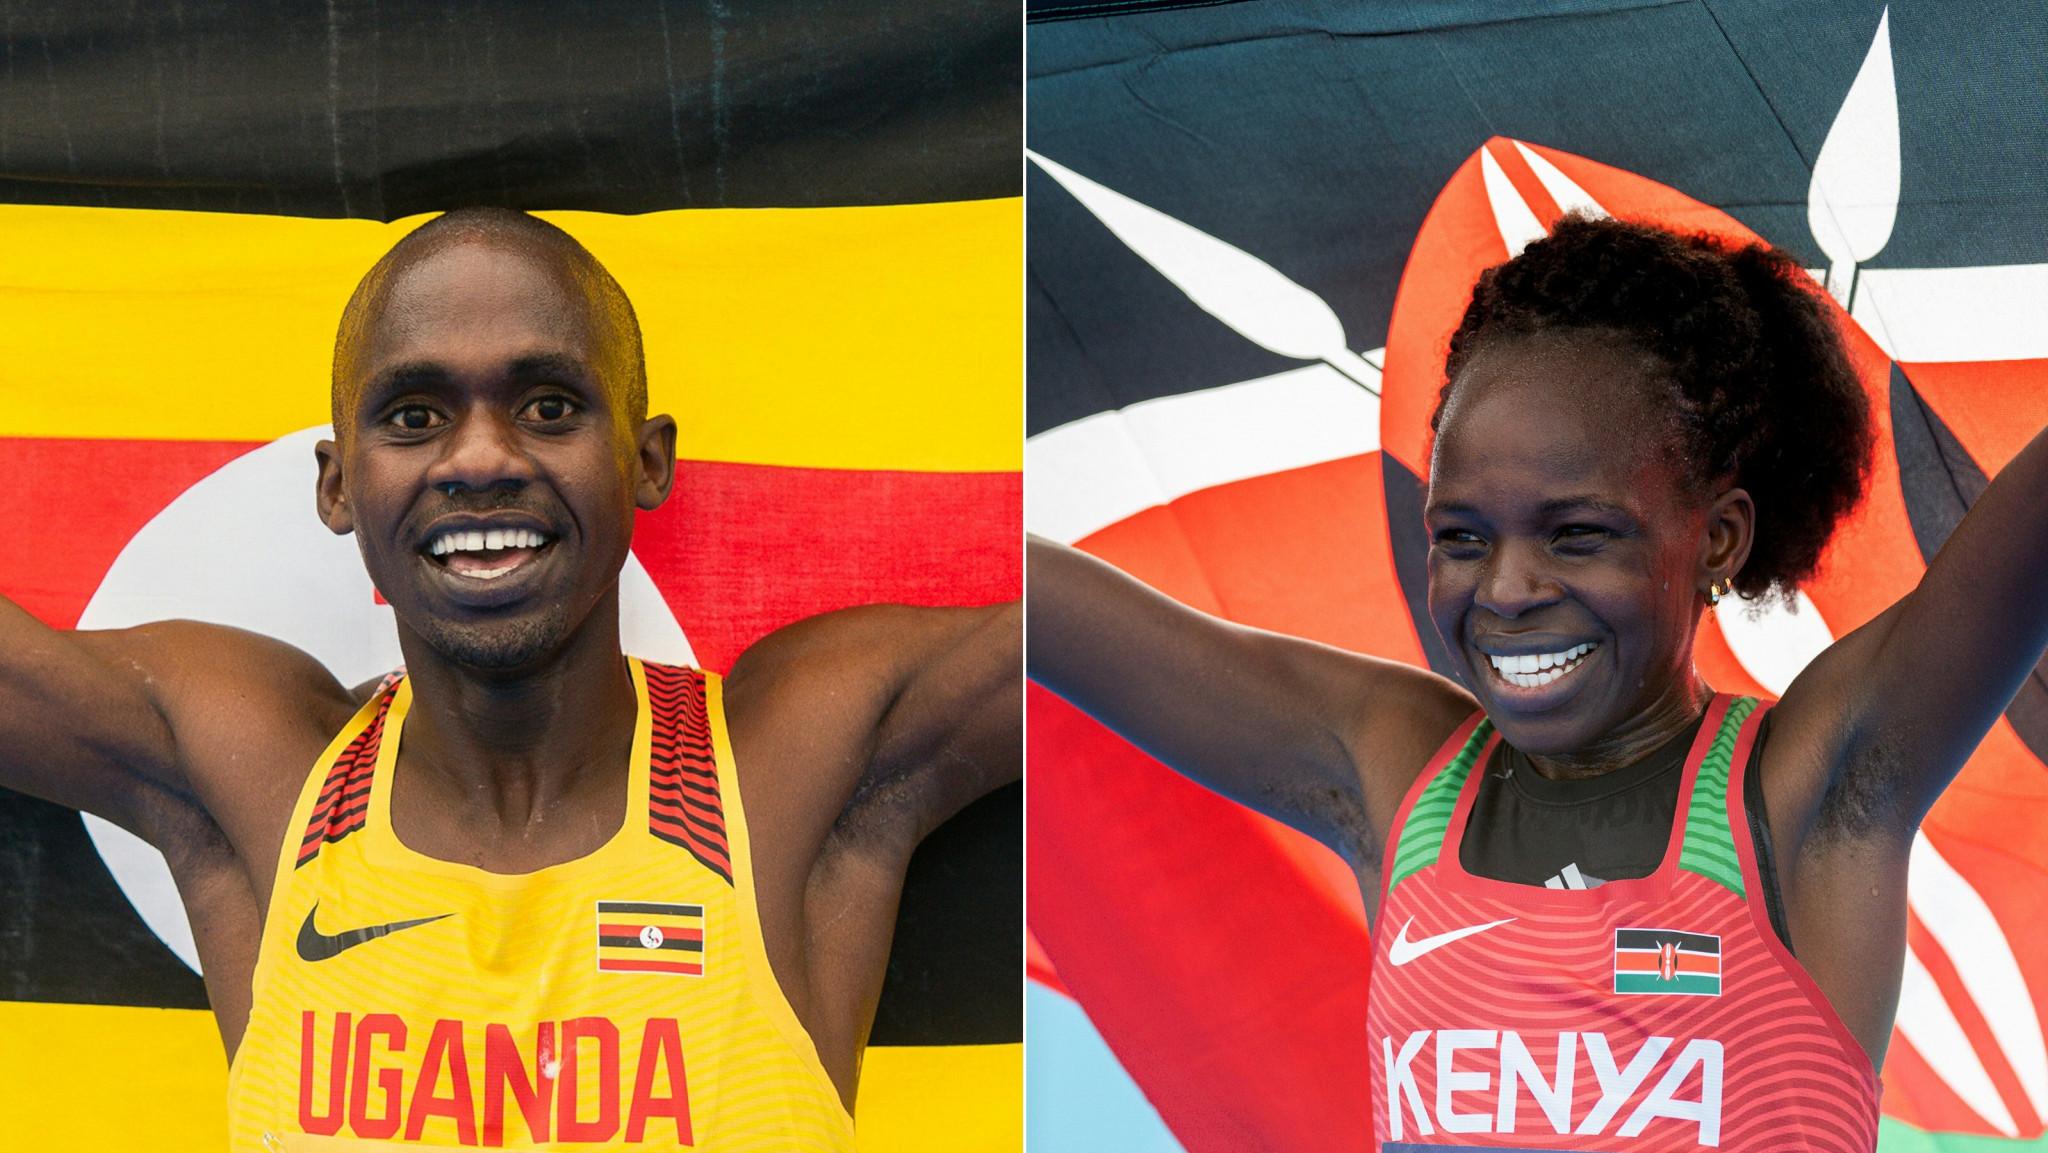 Uganda's Jacob Kiplimo and Kenya's Peres Jepchirchir, right, celebrate winning the IAAF World Half Marathon Championships in Gdynia ©Getty Images